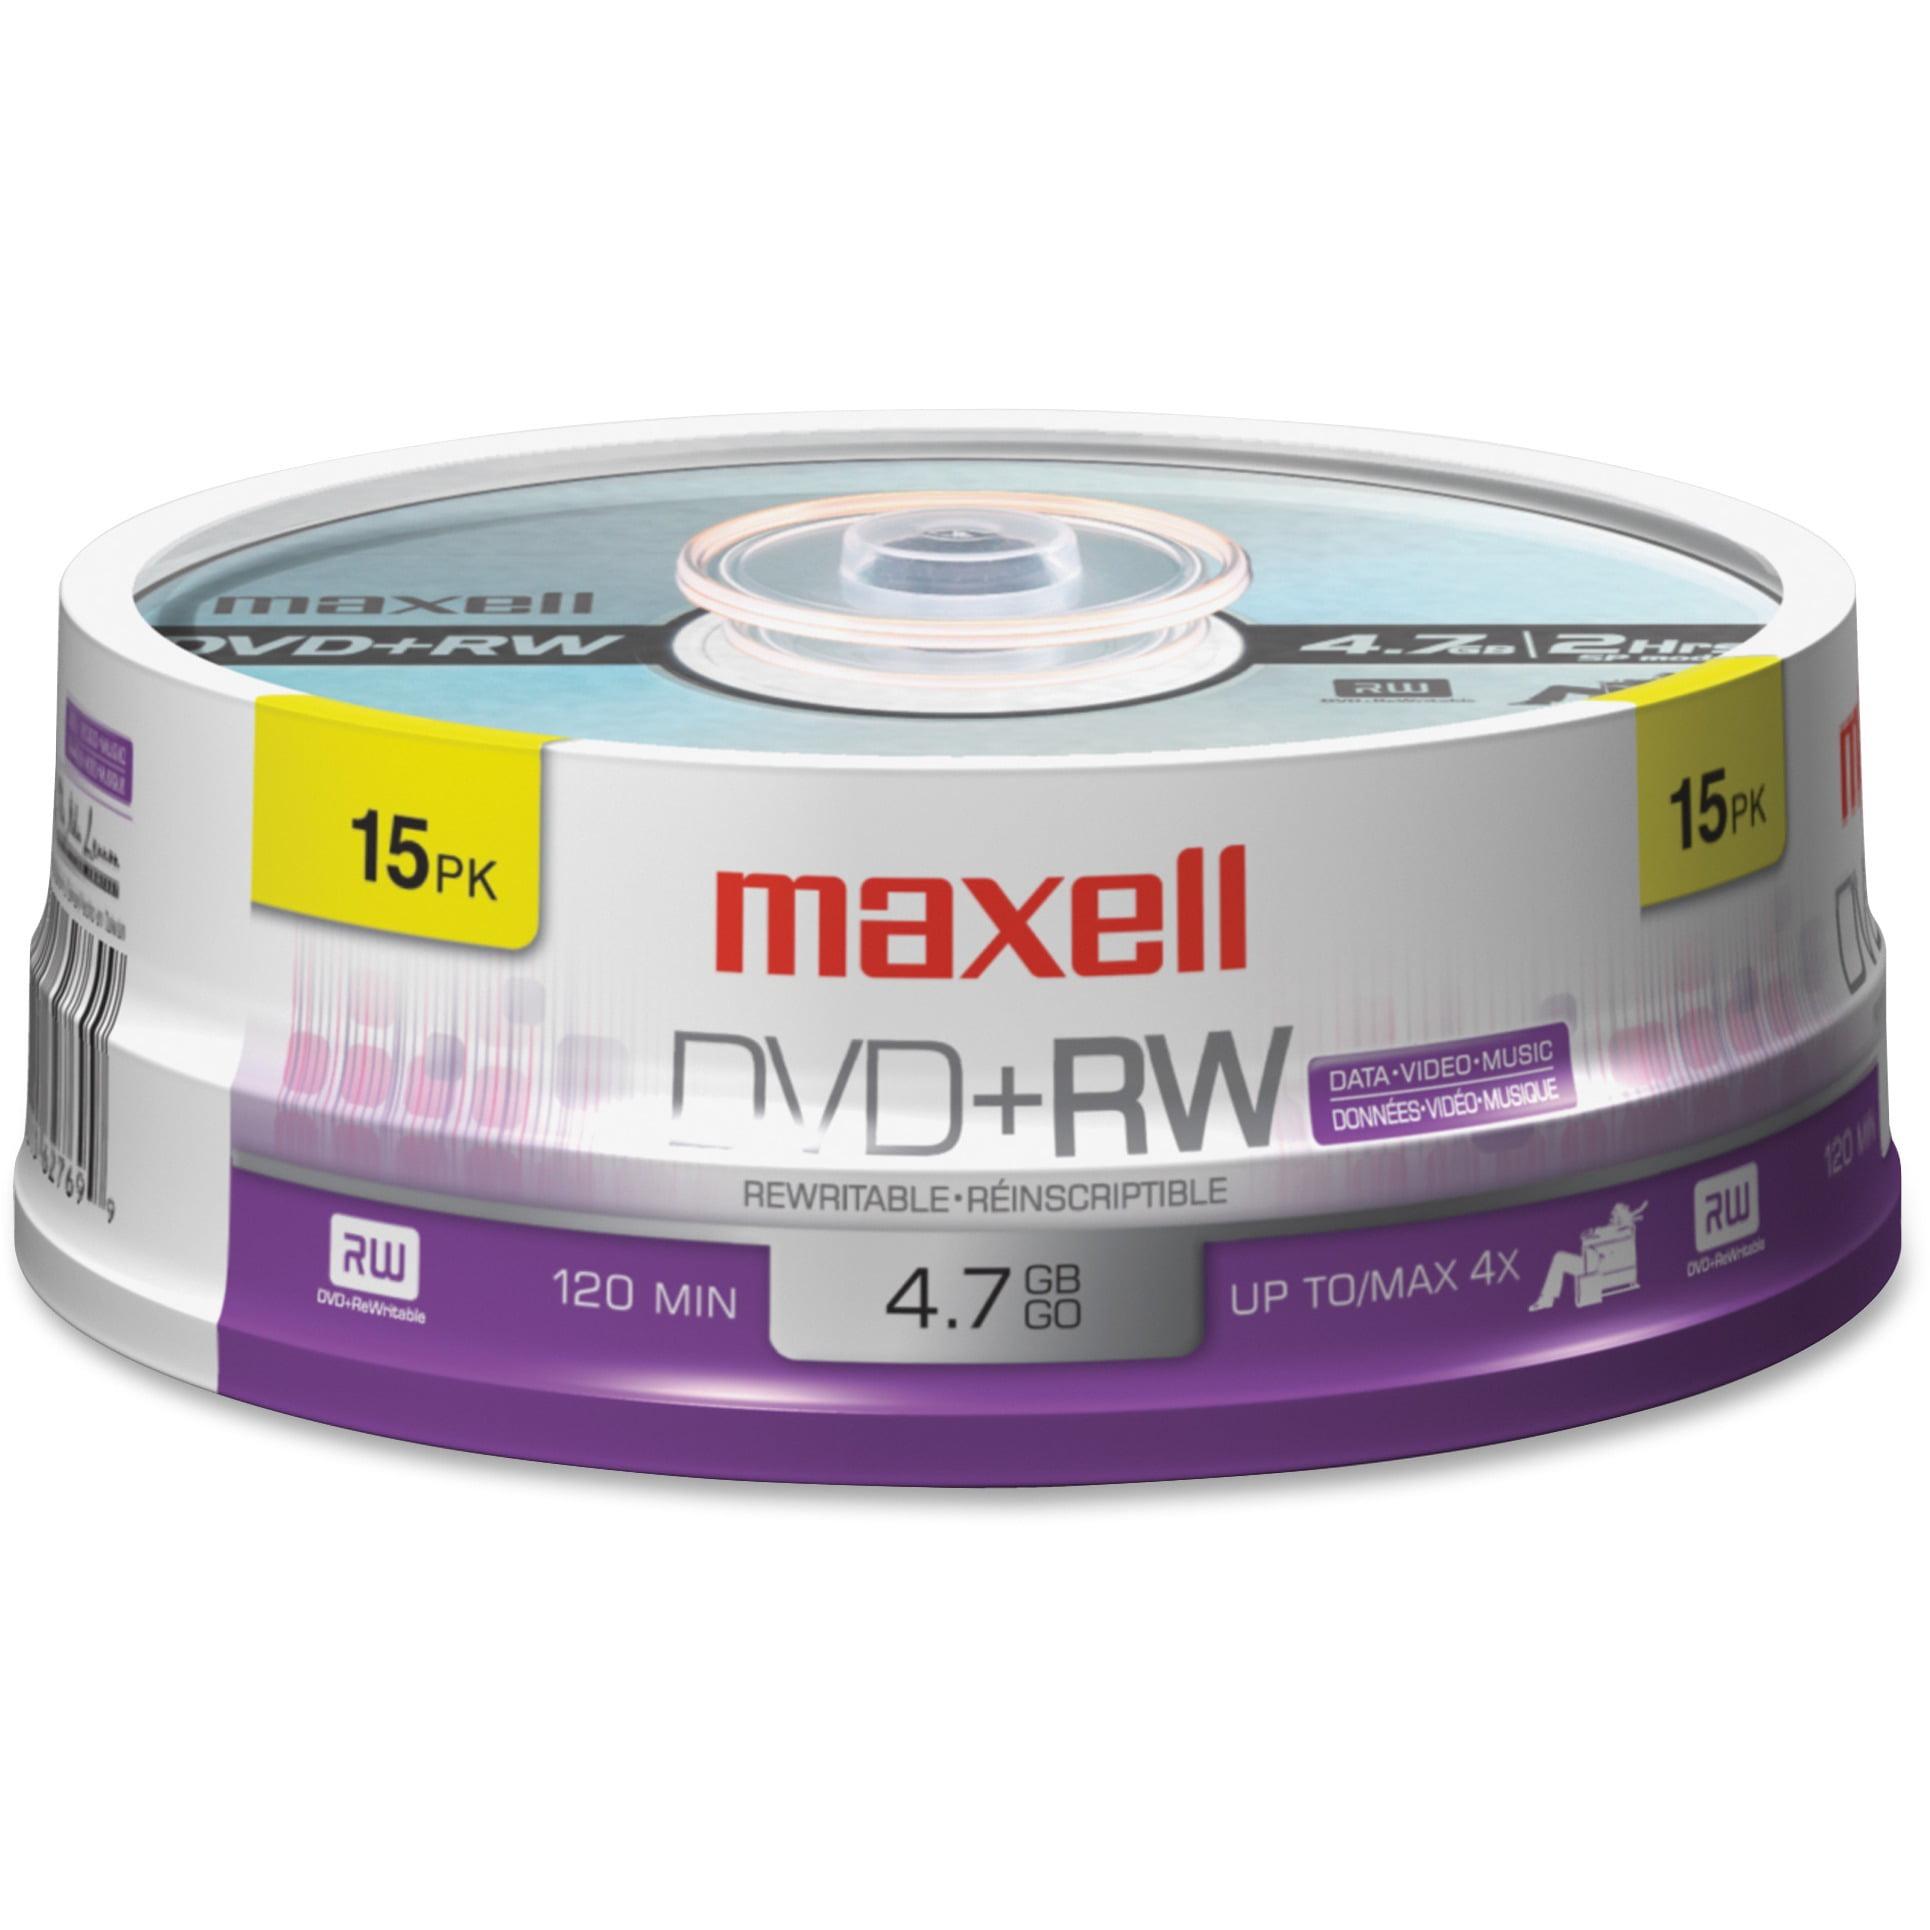 Maxell, MAX634046, 4.7GB DVD+RWs, 1